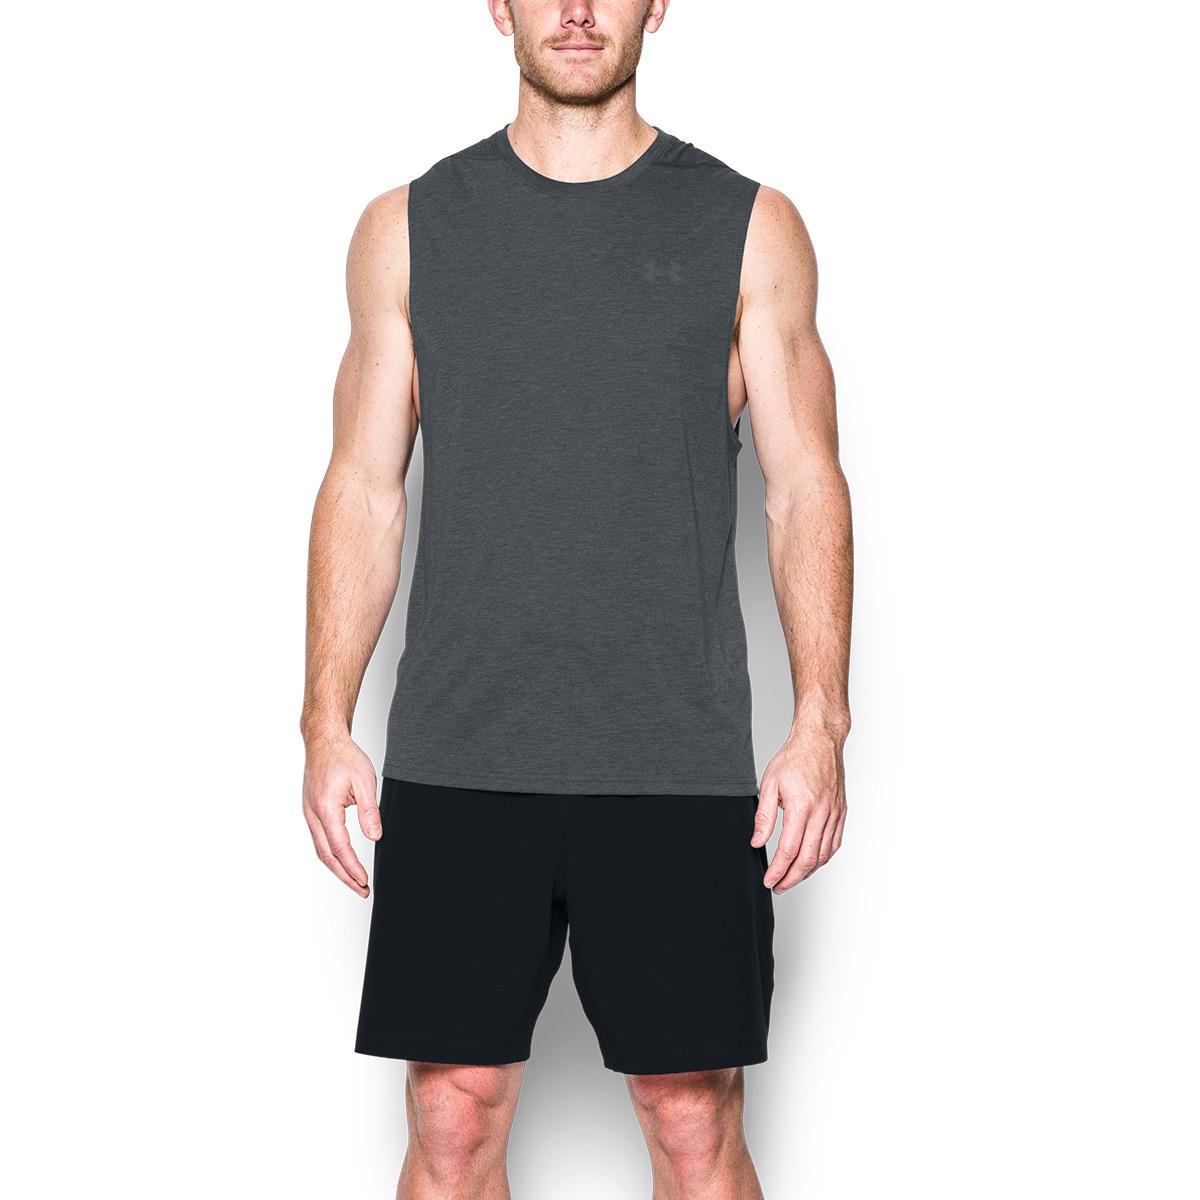 b4c6943958b86 Under Armour Mens UA Threadborne Muscle Tank Sports Gym Vest 27% OFF ...